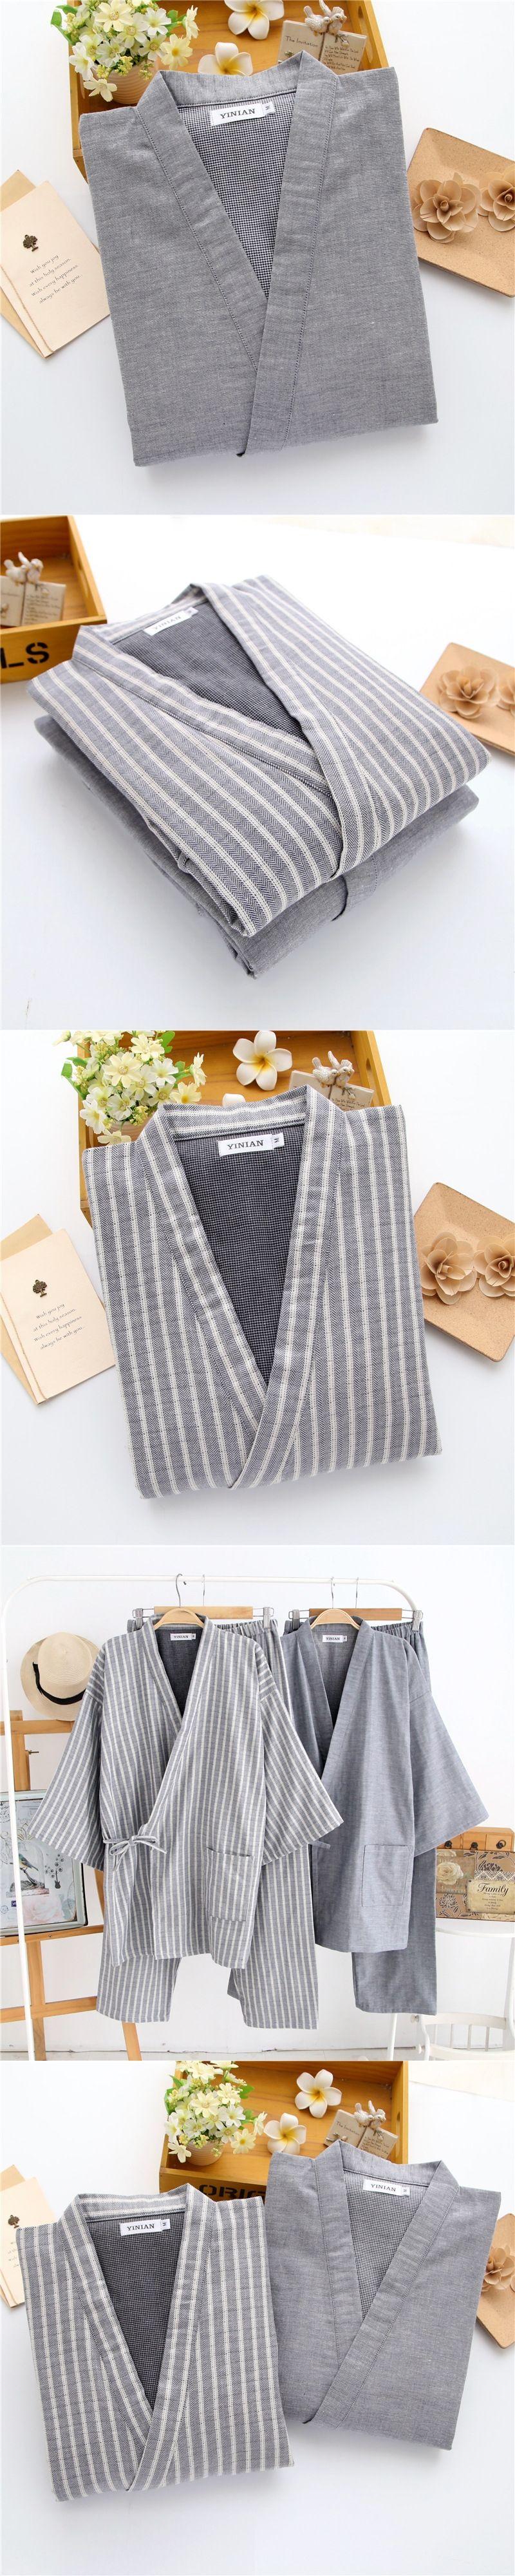 f95f3ea0c0 Cotton Yukata Japanese Kimono Style Mens Pajama Sets Traditional Japanese  Pajamas Men s Sleepwear Lounge Home Clothing